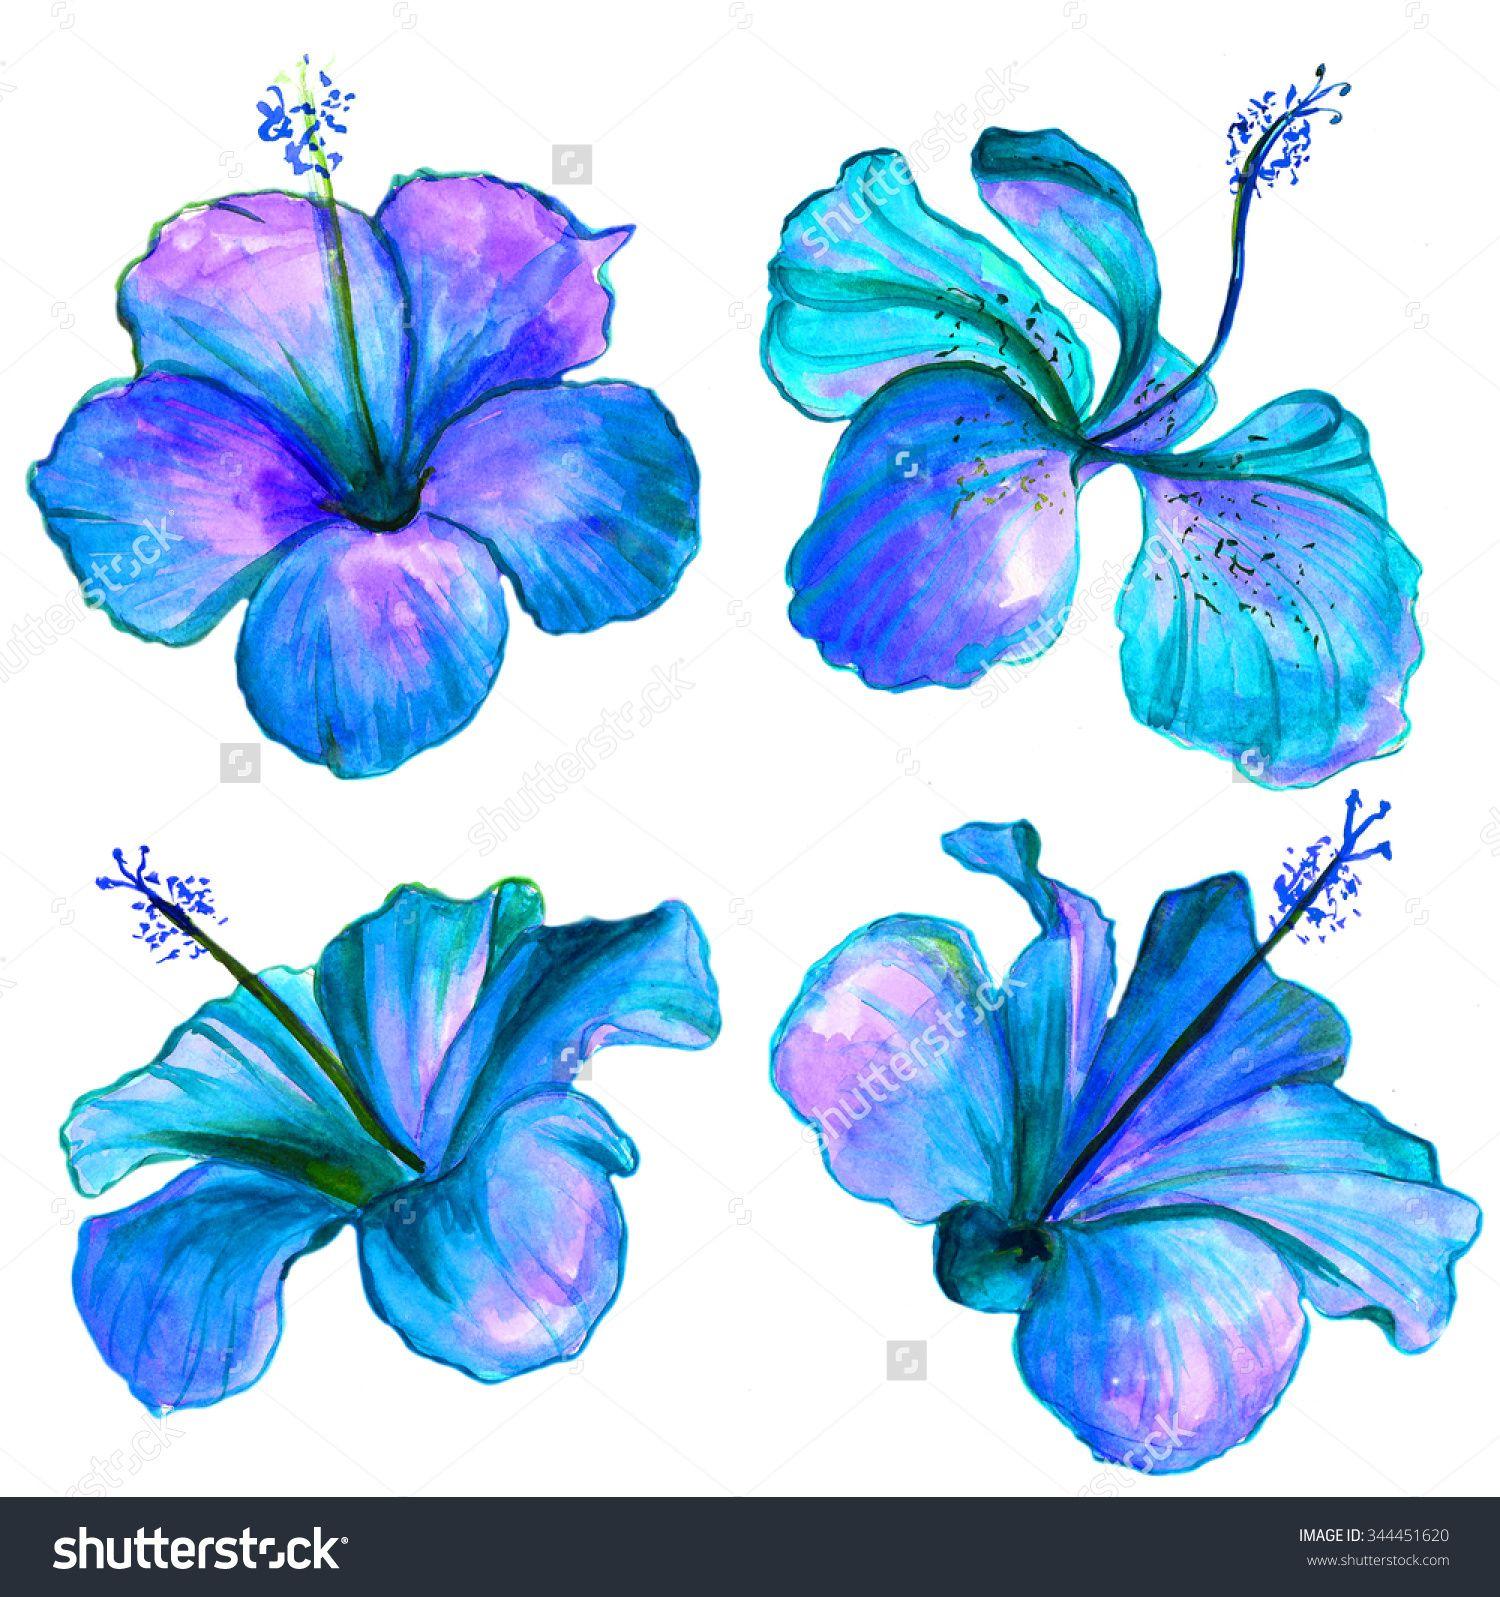 Pin by bozena on tattoes pinterest tattoo flower graphicflower clipartflower picturesalbumtattoodaisydrawinginstitute flower izmirmasajfo Images